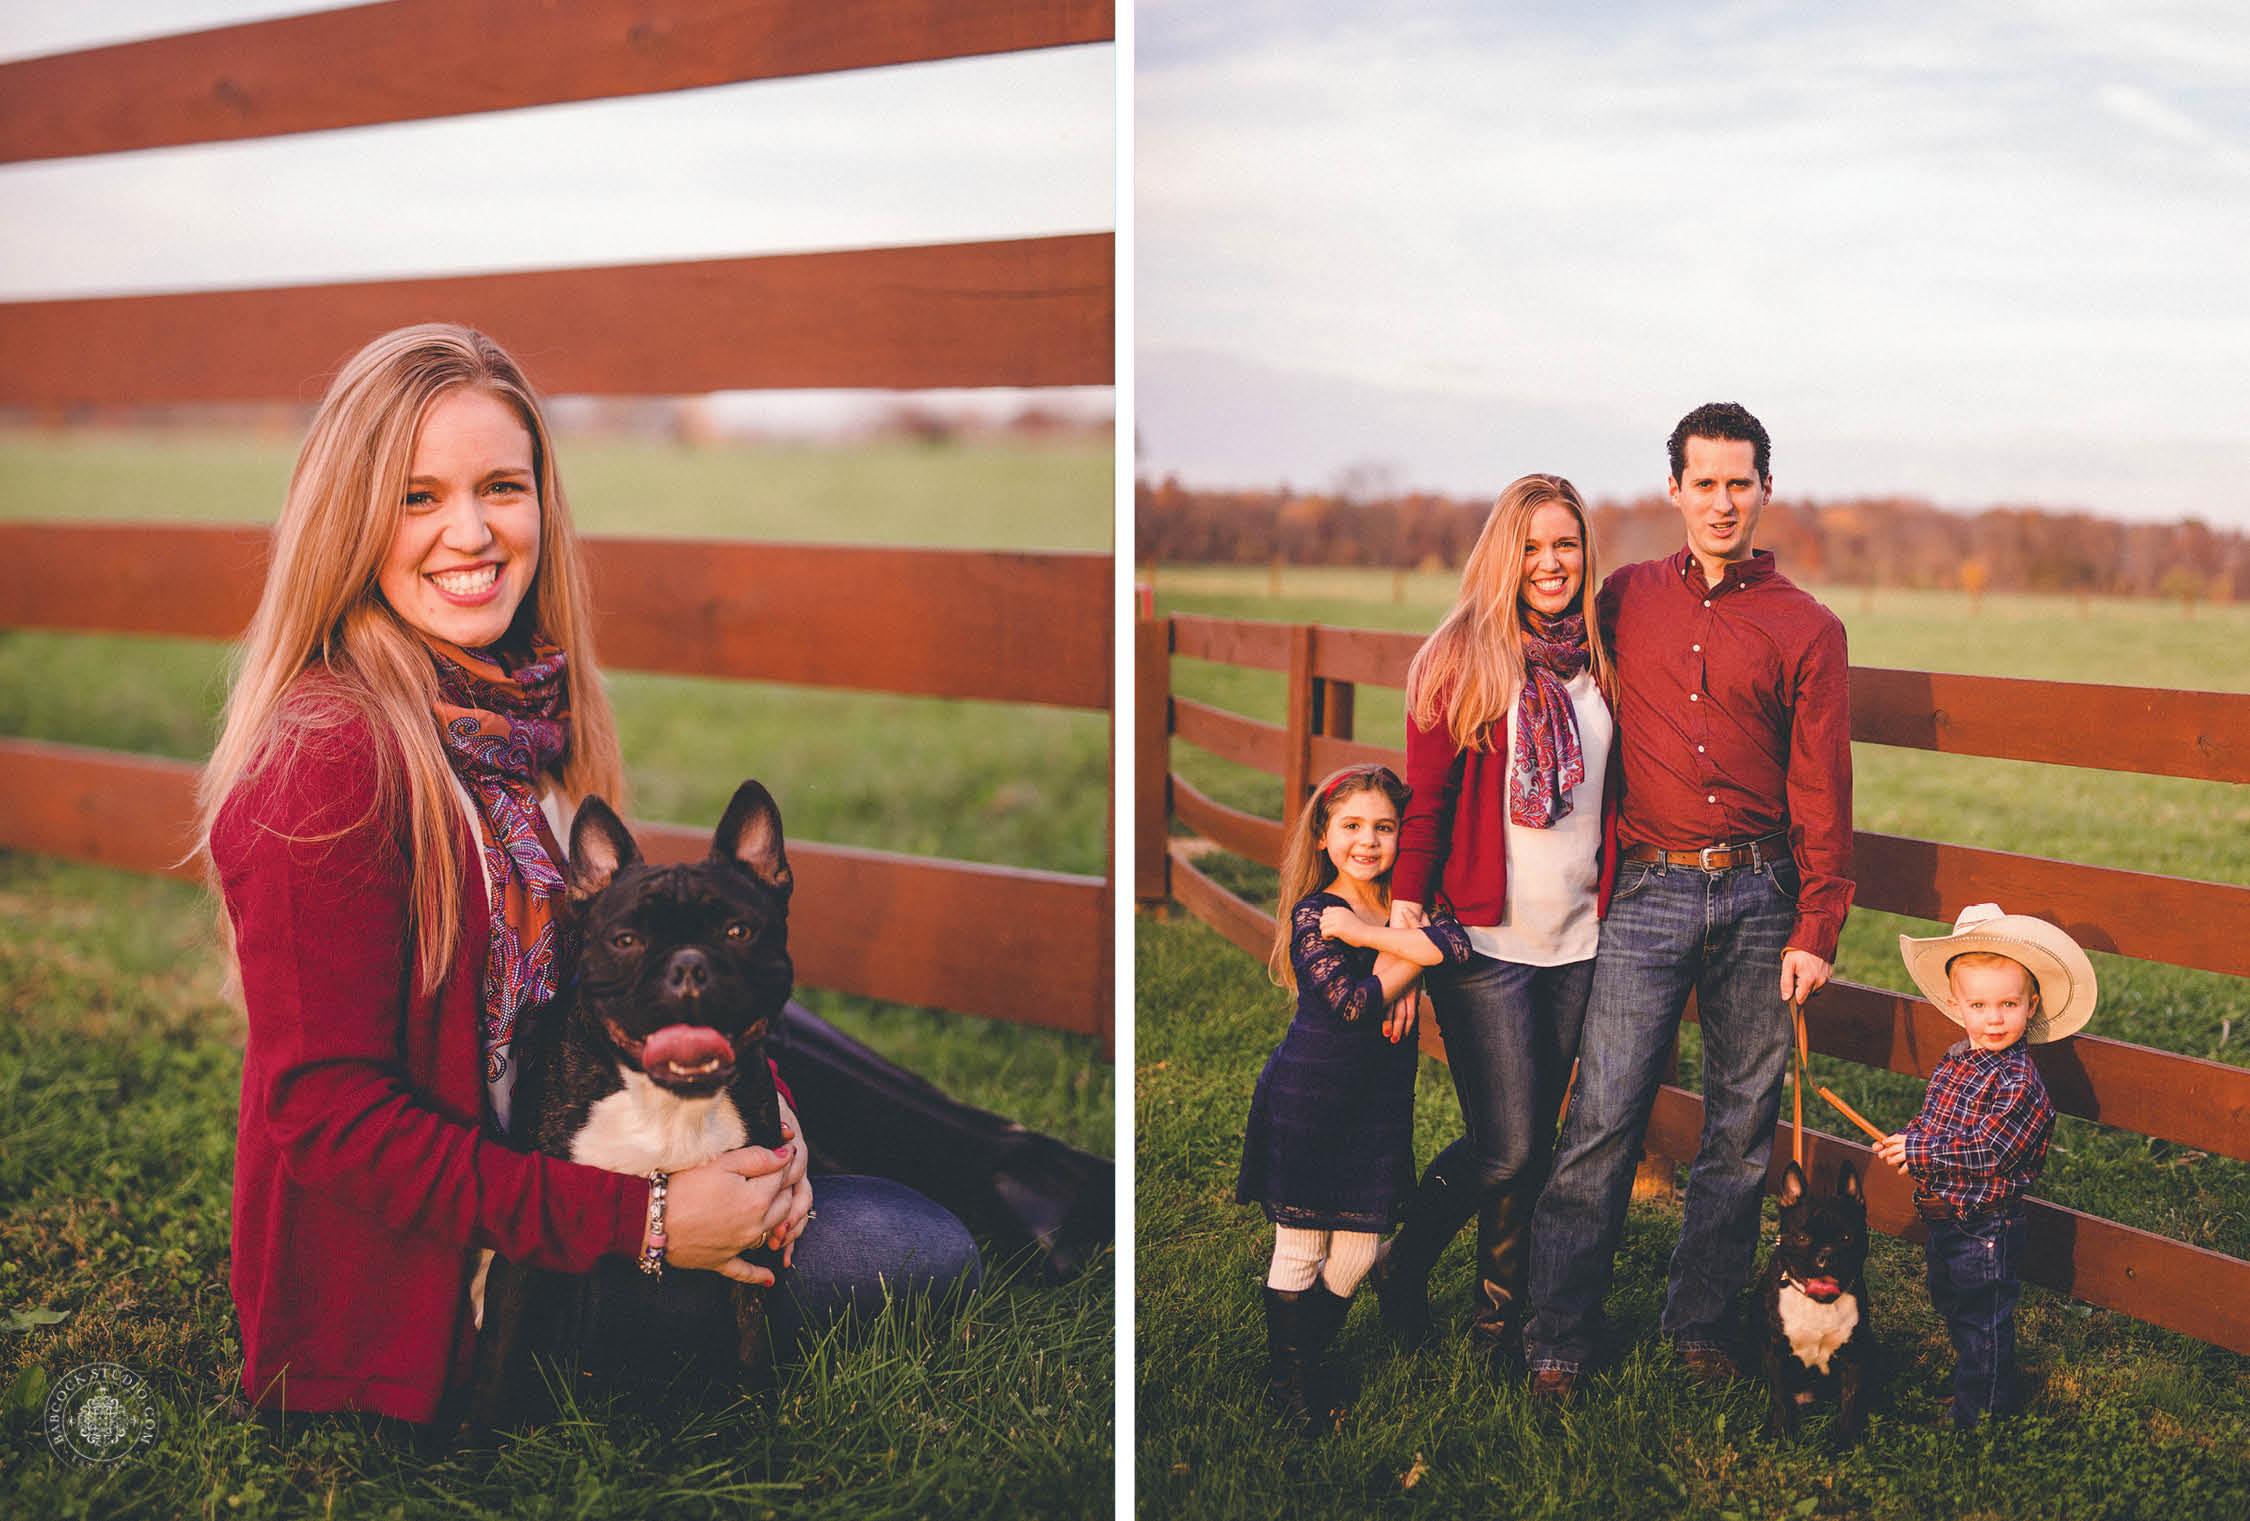 vance-family-children-photographer-dayton-ohio-13.jpg